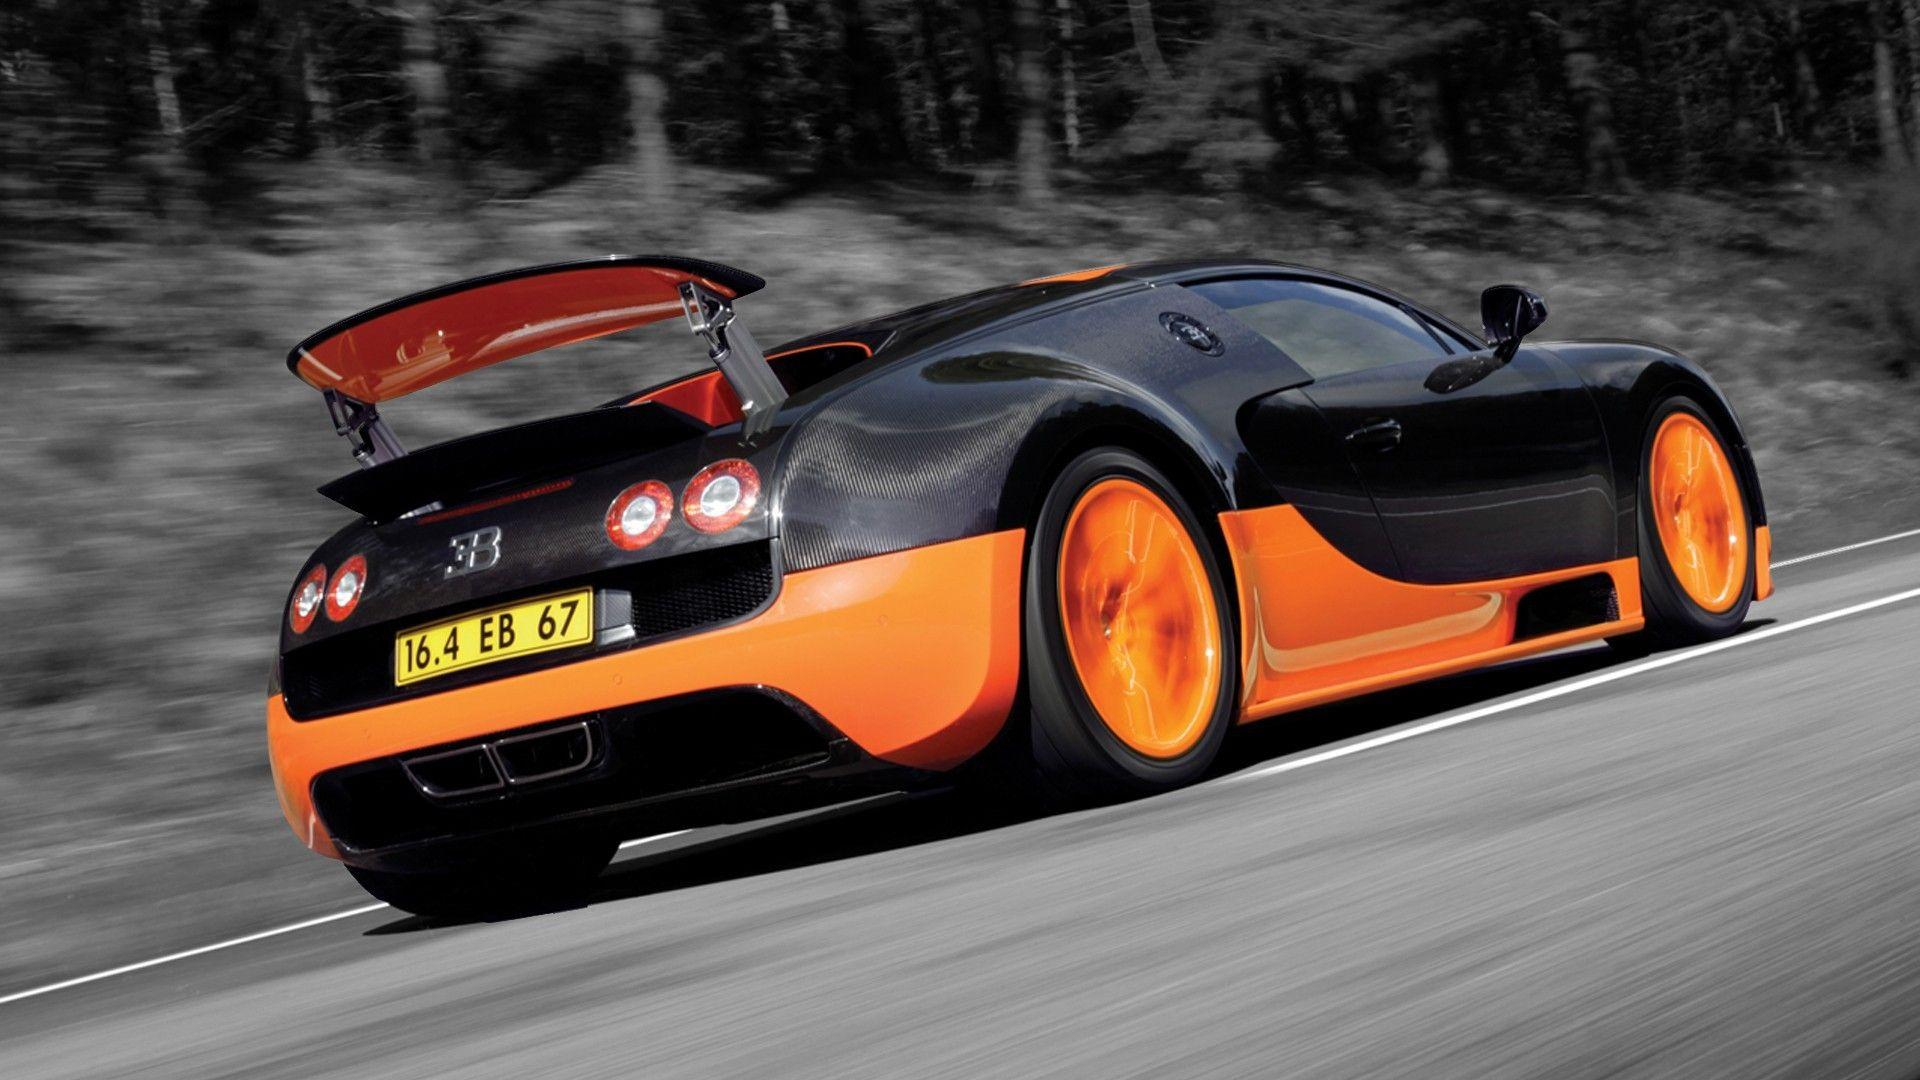 Tablet Pc Images Of Bugatti Veyron Super Sport By Inocencio Bugatti Veyron Wallpaper Hd 1920x1080 Wallpaper Teahub Io